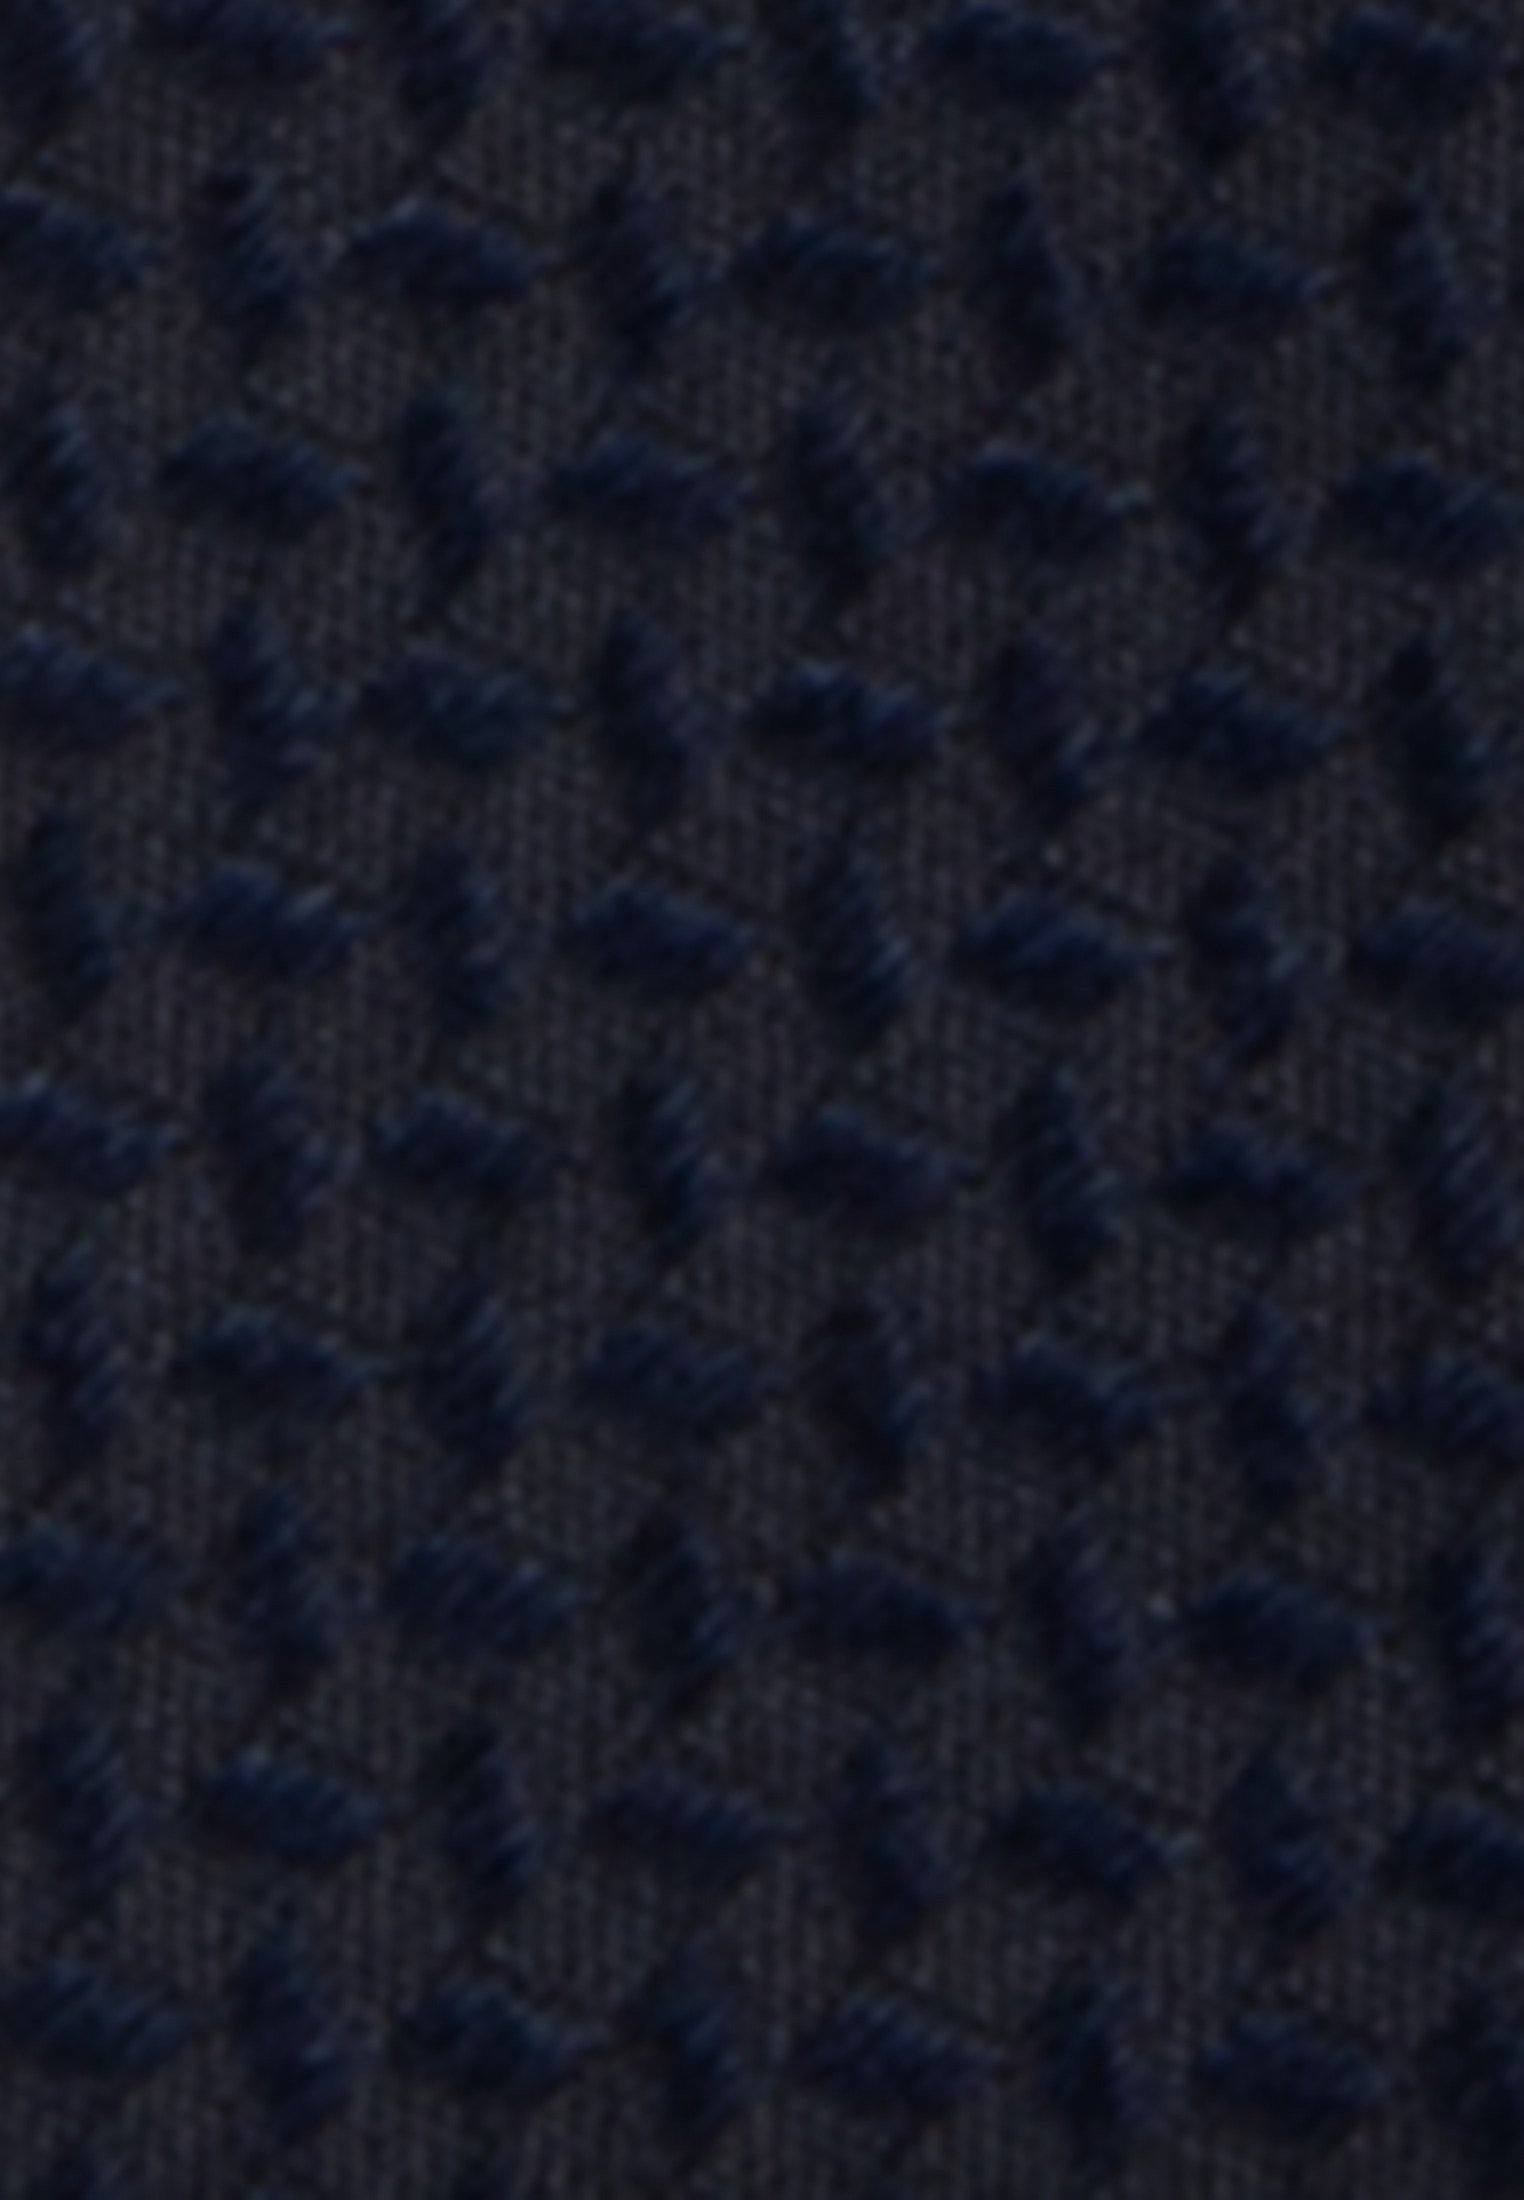 Seidensticker Slim Fit - Krawatte - dunkelblau - Herrenaccessoires 8x9GV